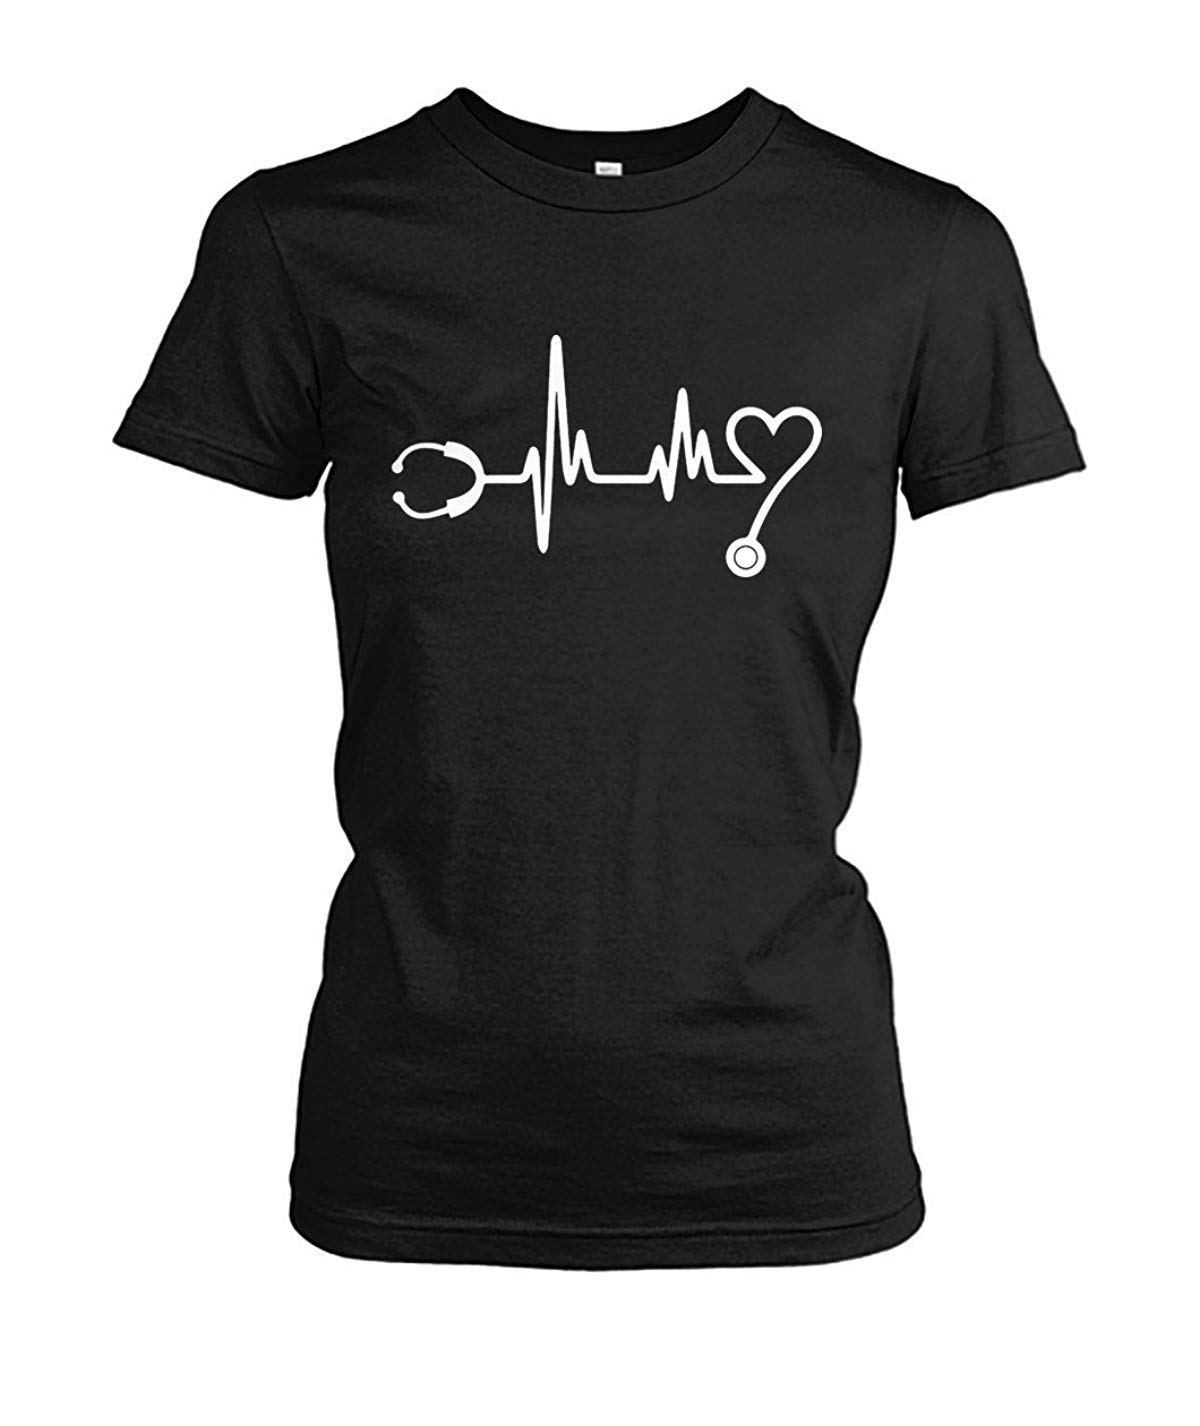 Heartbeat Nurse Funny TShirt For Women in 2020 Funny